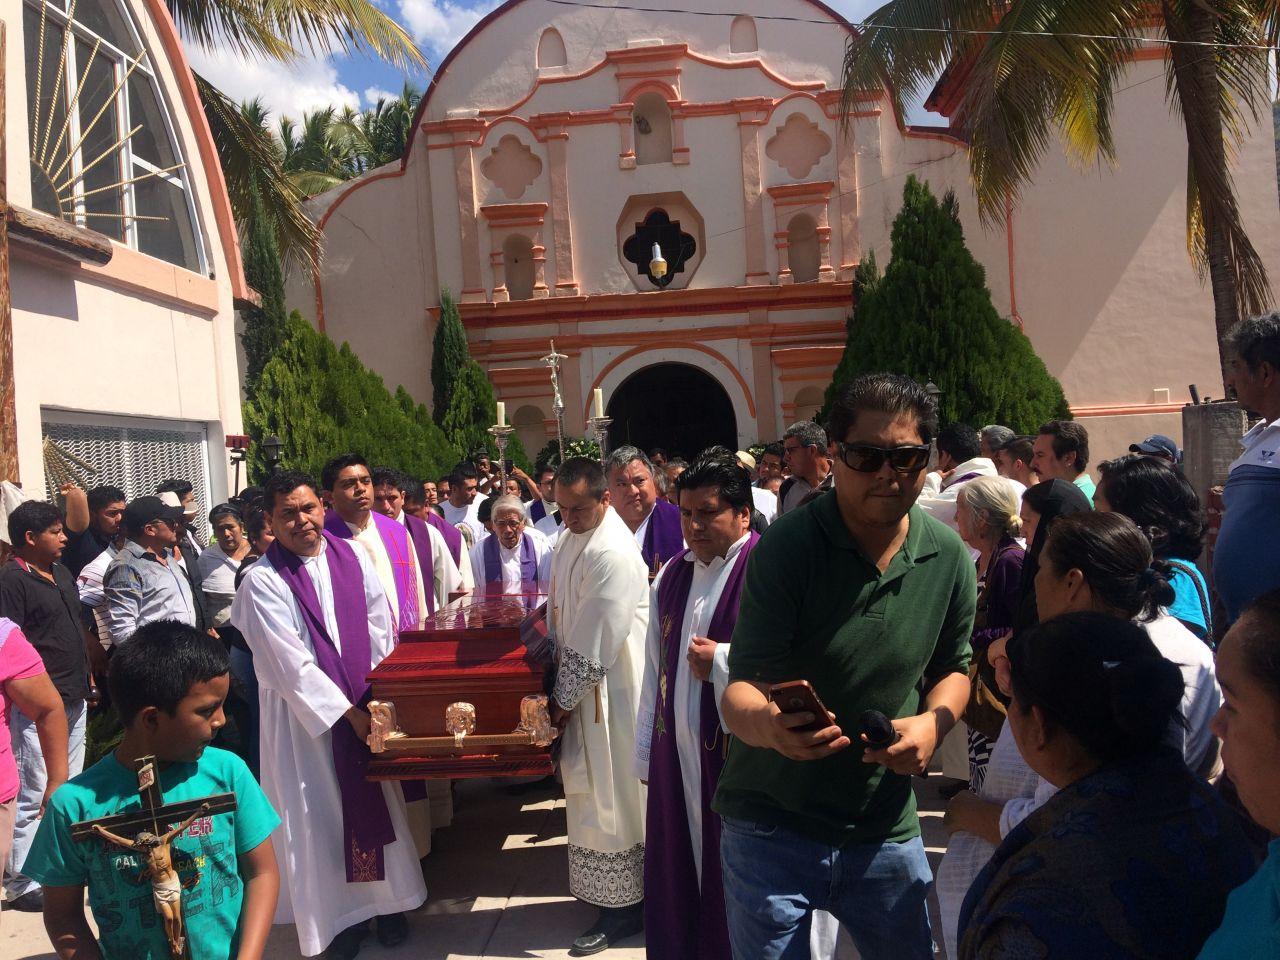 Obispo de Chilpancingo afirma que asesinato de sacerdotes fue por incidente vial